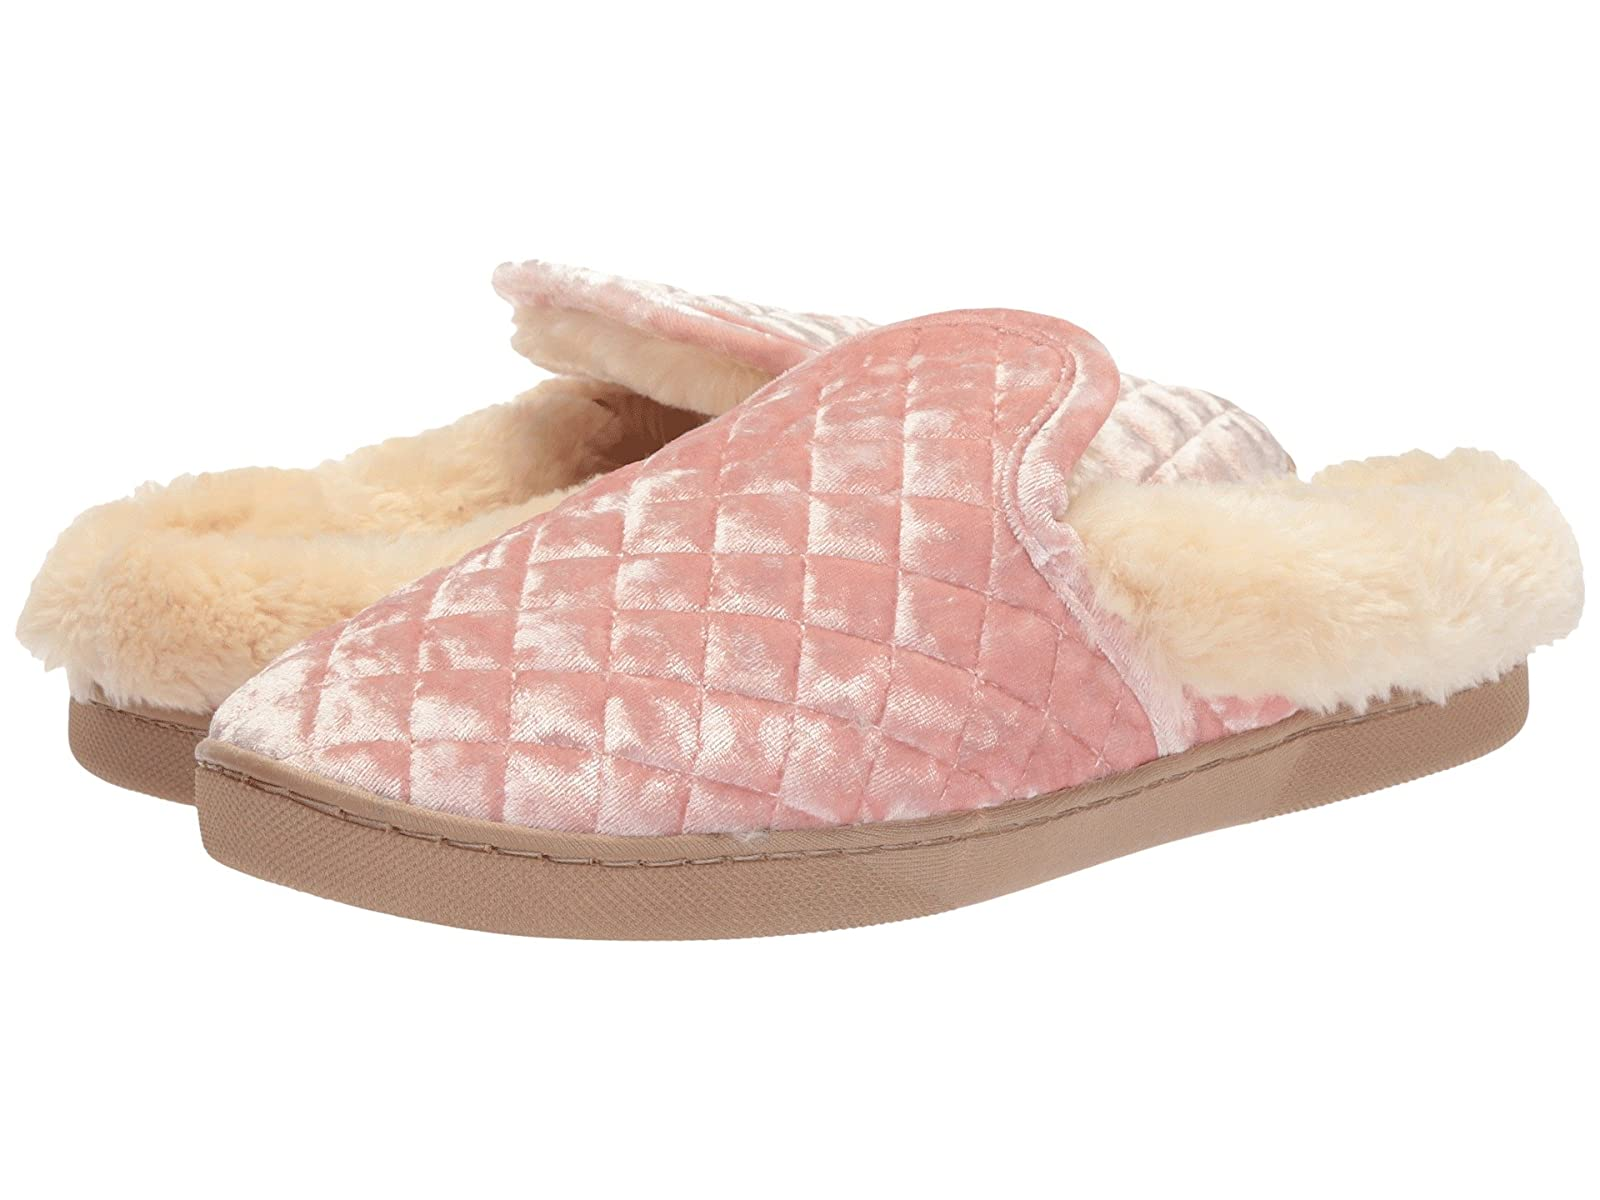 Steve Madden QueenieAtmospheric grades have affordable shoes